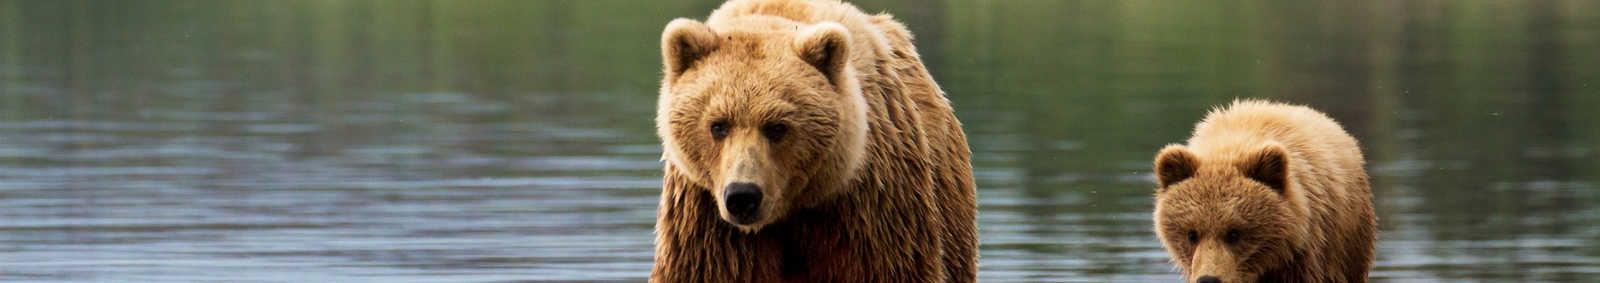 Brown bear sow and cub, Alaska